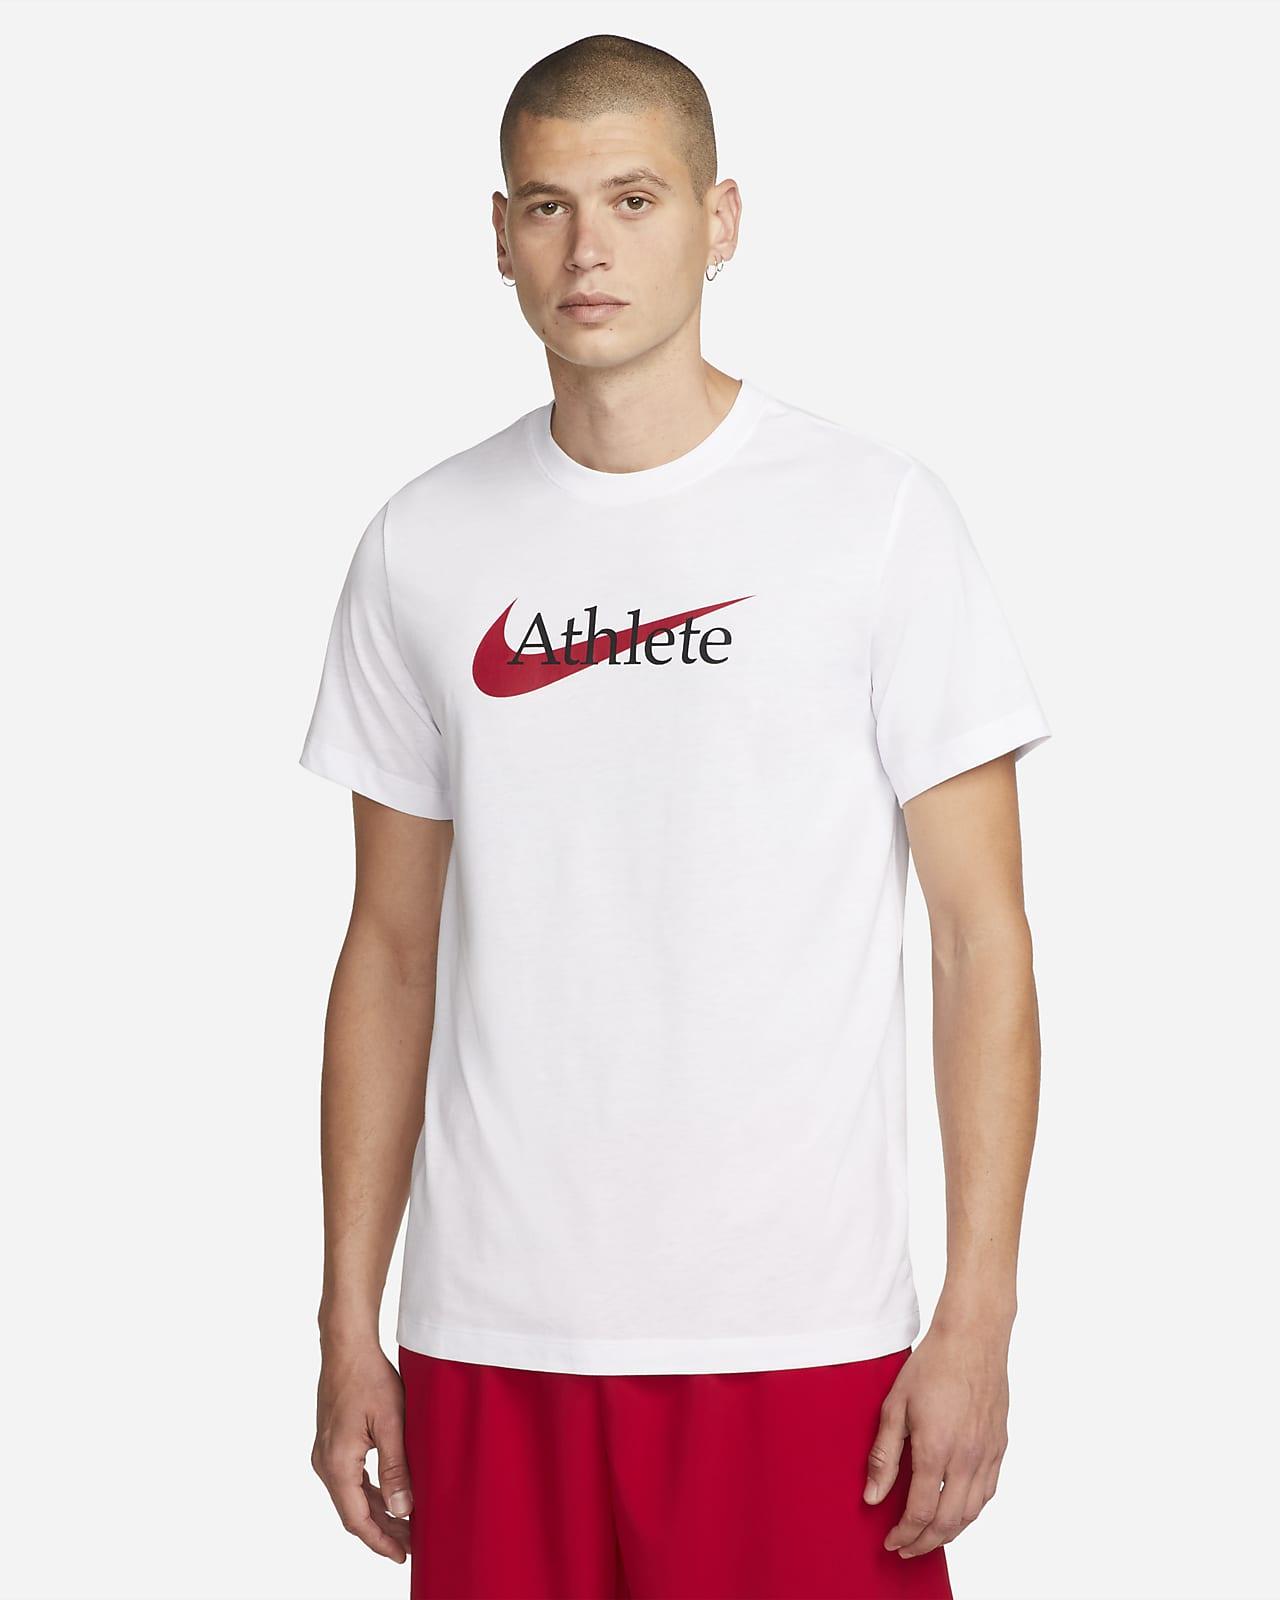 Nike Dri-FIT Trainings-T-Shirt mit Swoosh für Herren